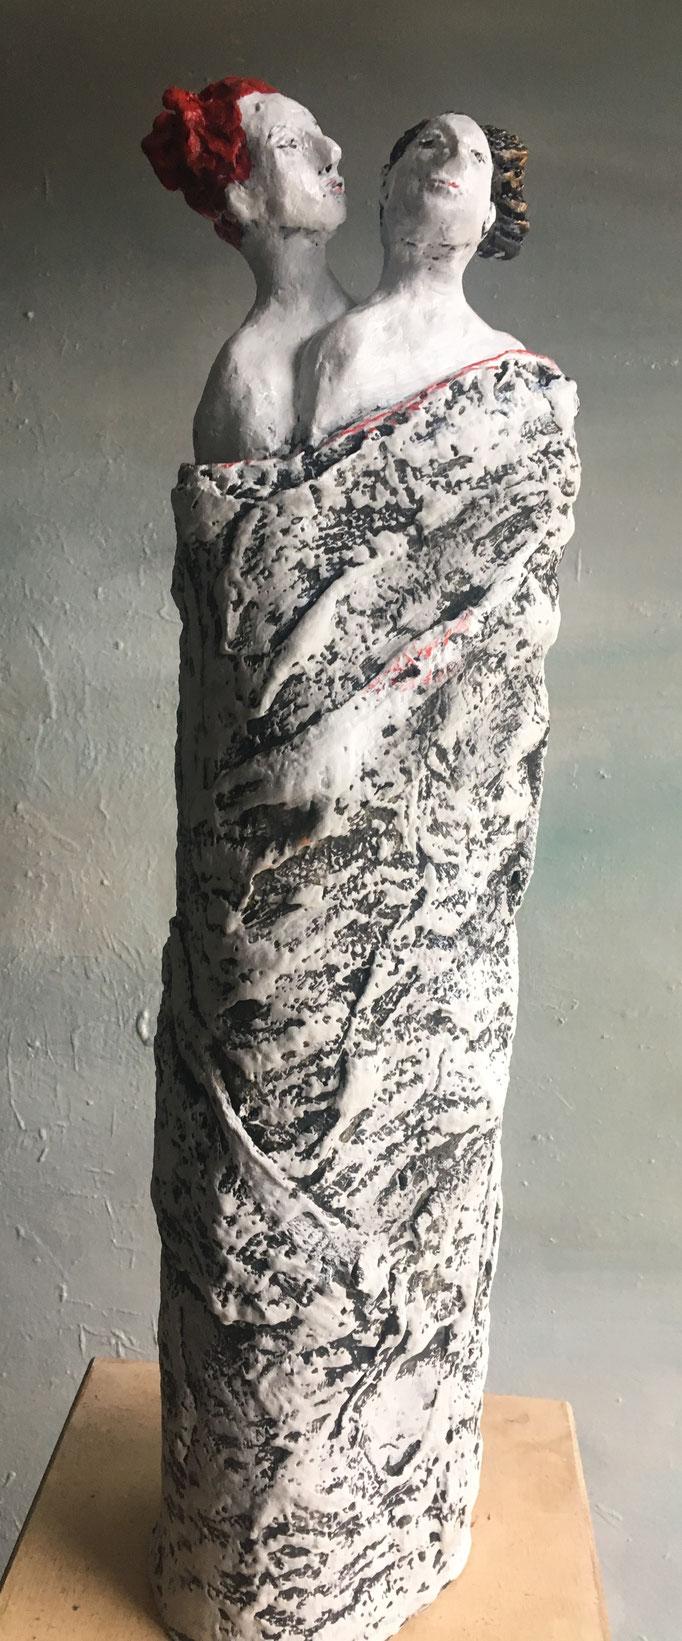 Zu zweit | Keramik | 2018